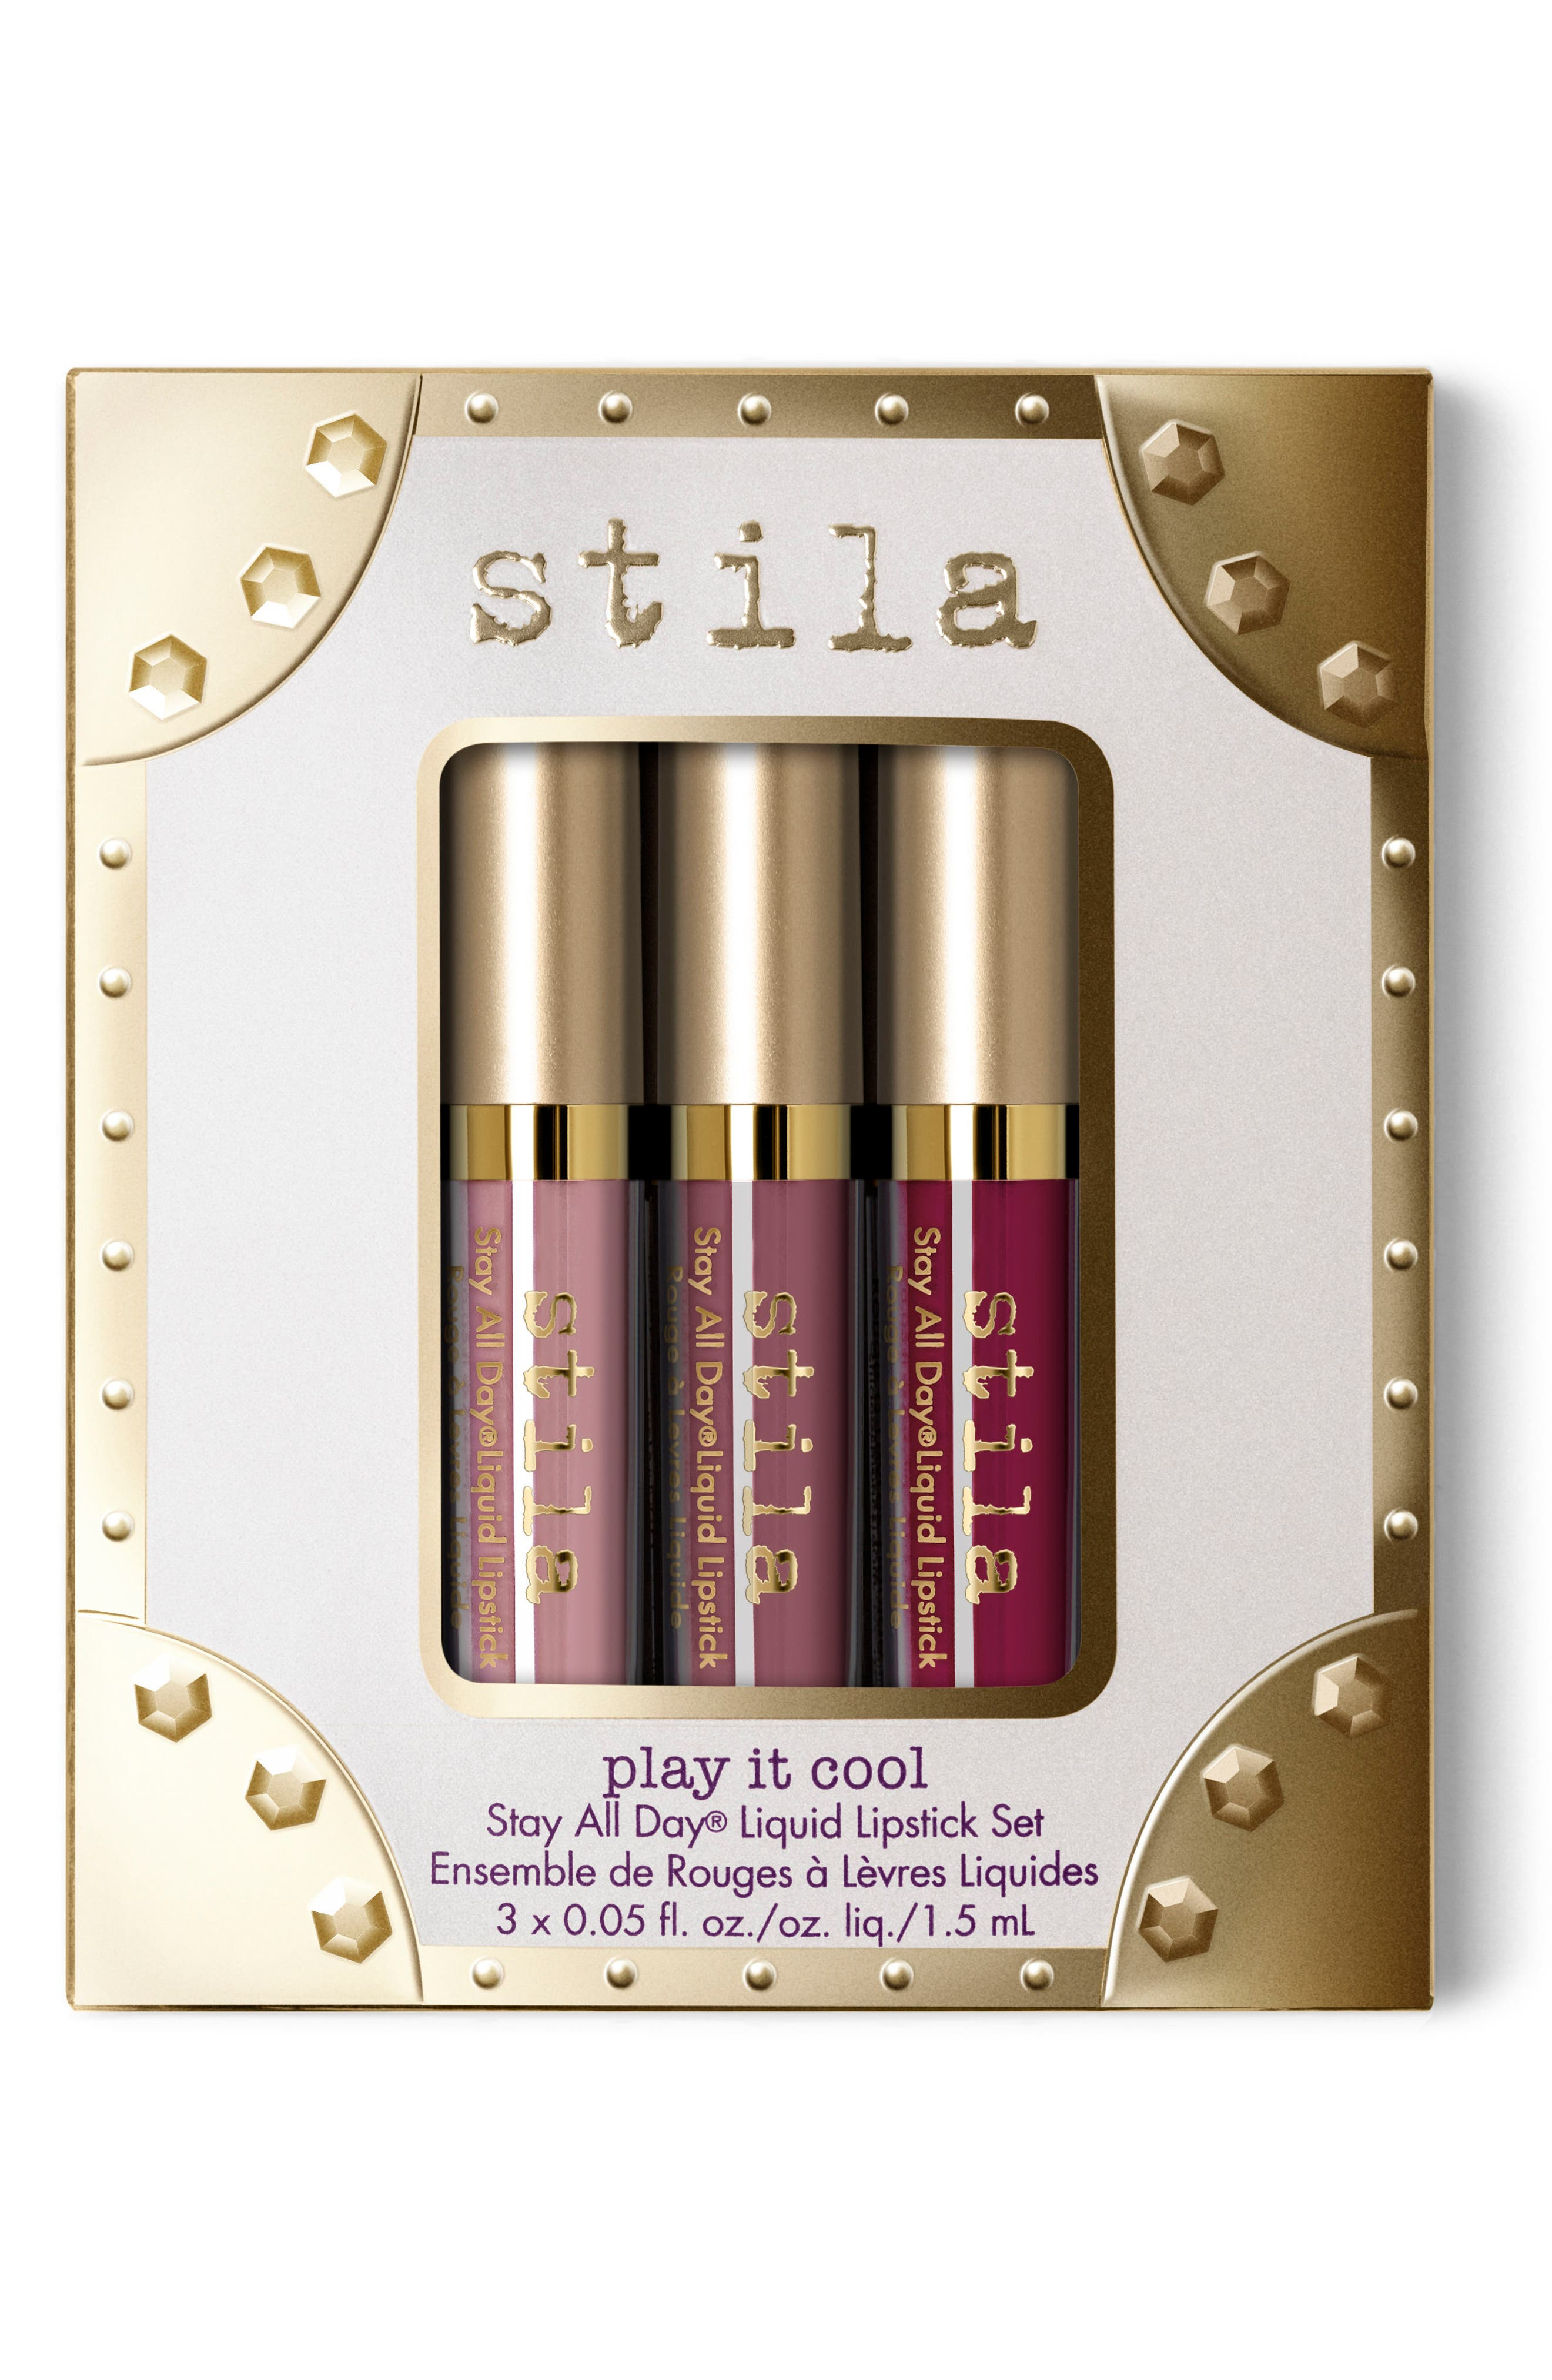 Main Image - stila play it cool stay all day liquid lipstick set ($33 Value)